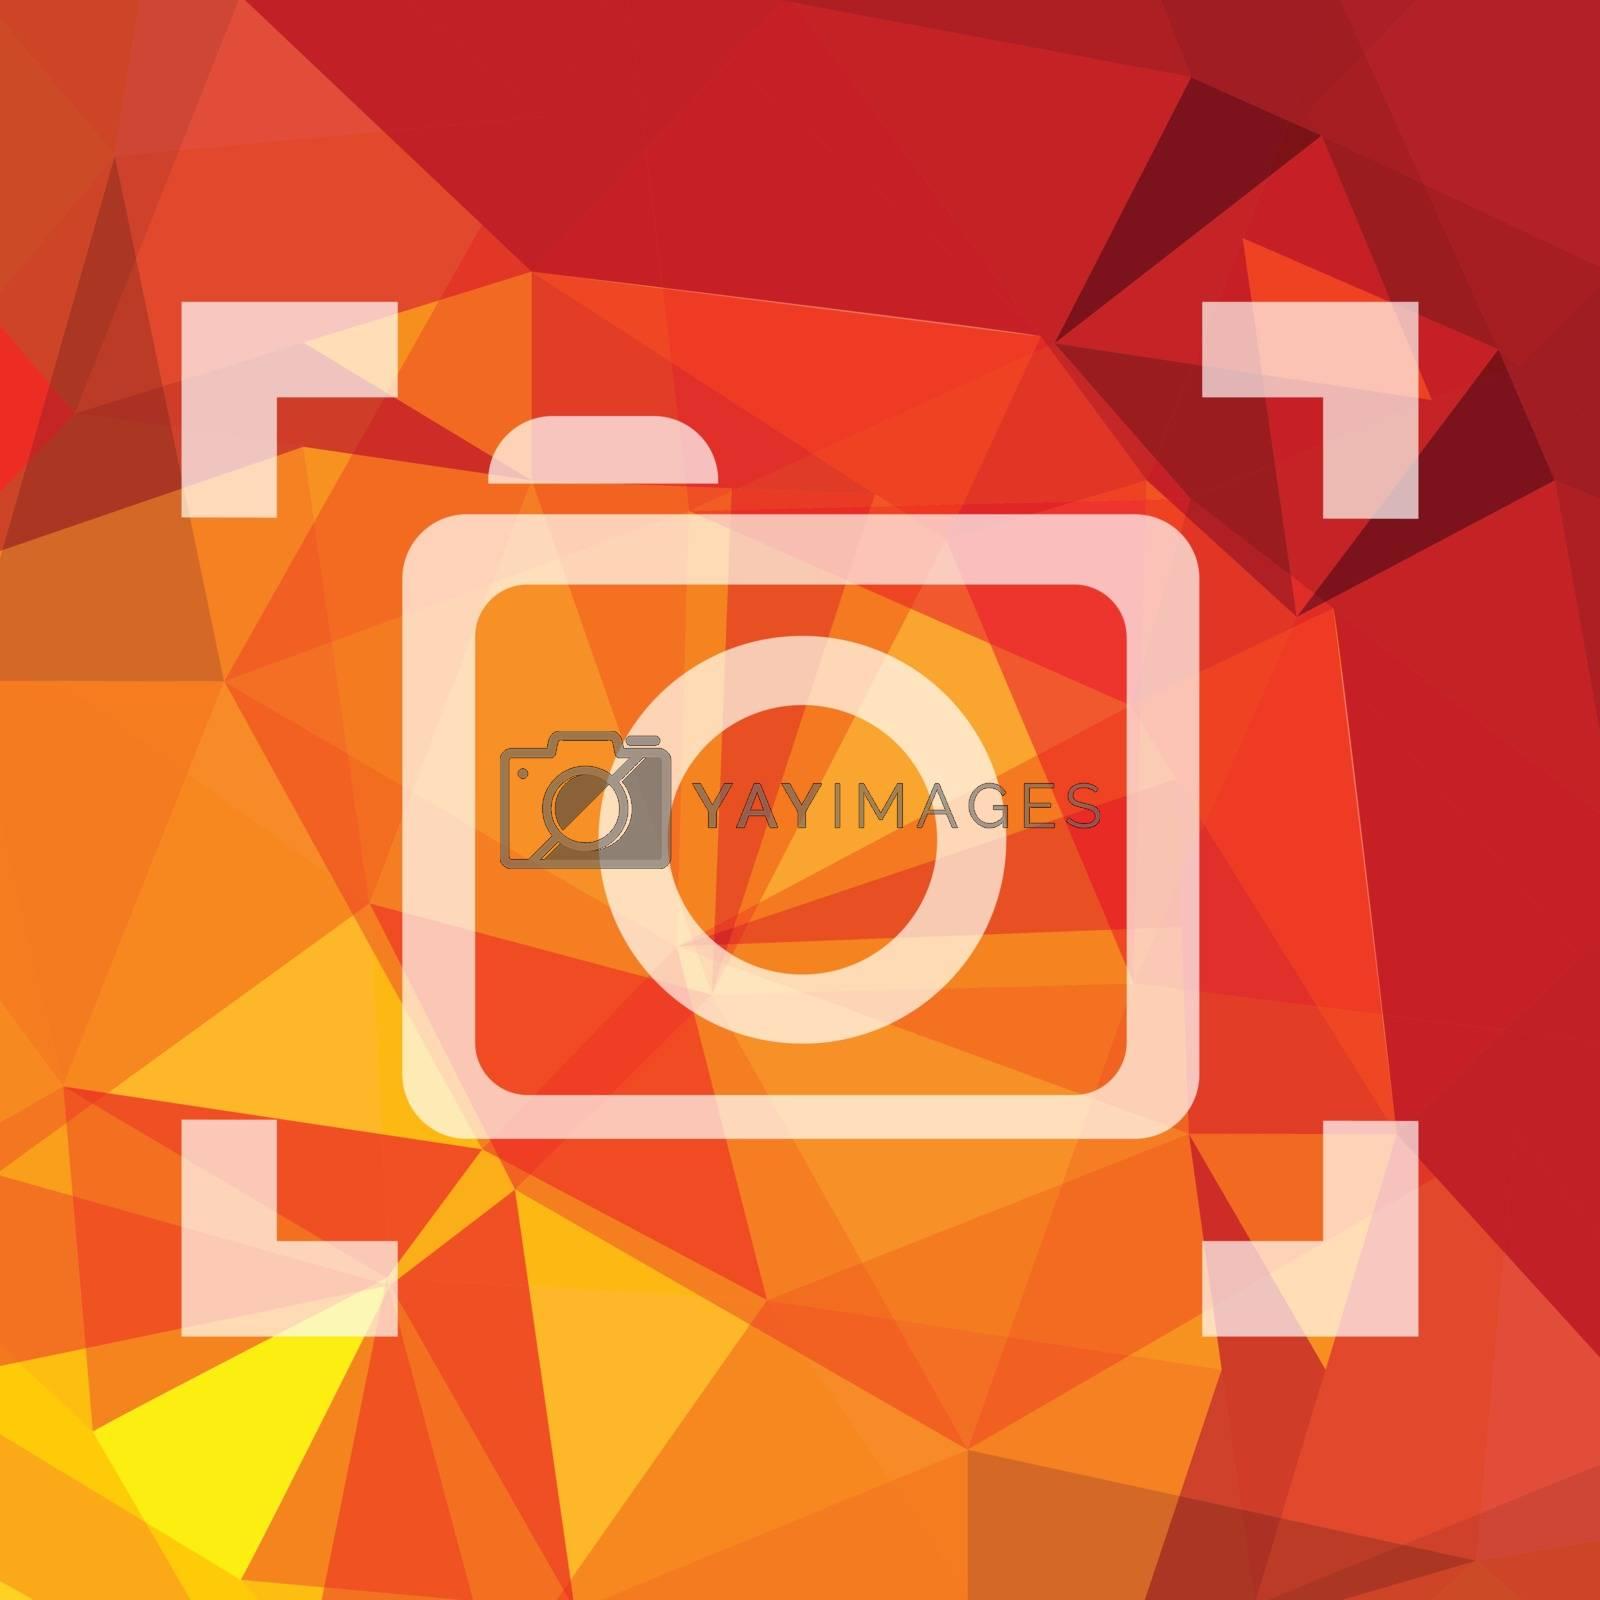 Royalty free image of camera symbol by valeo5